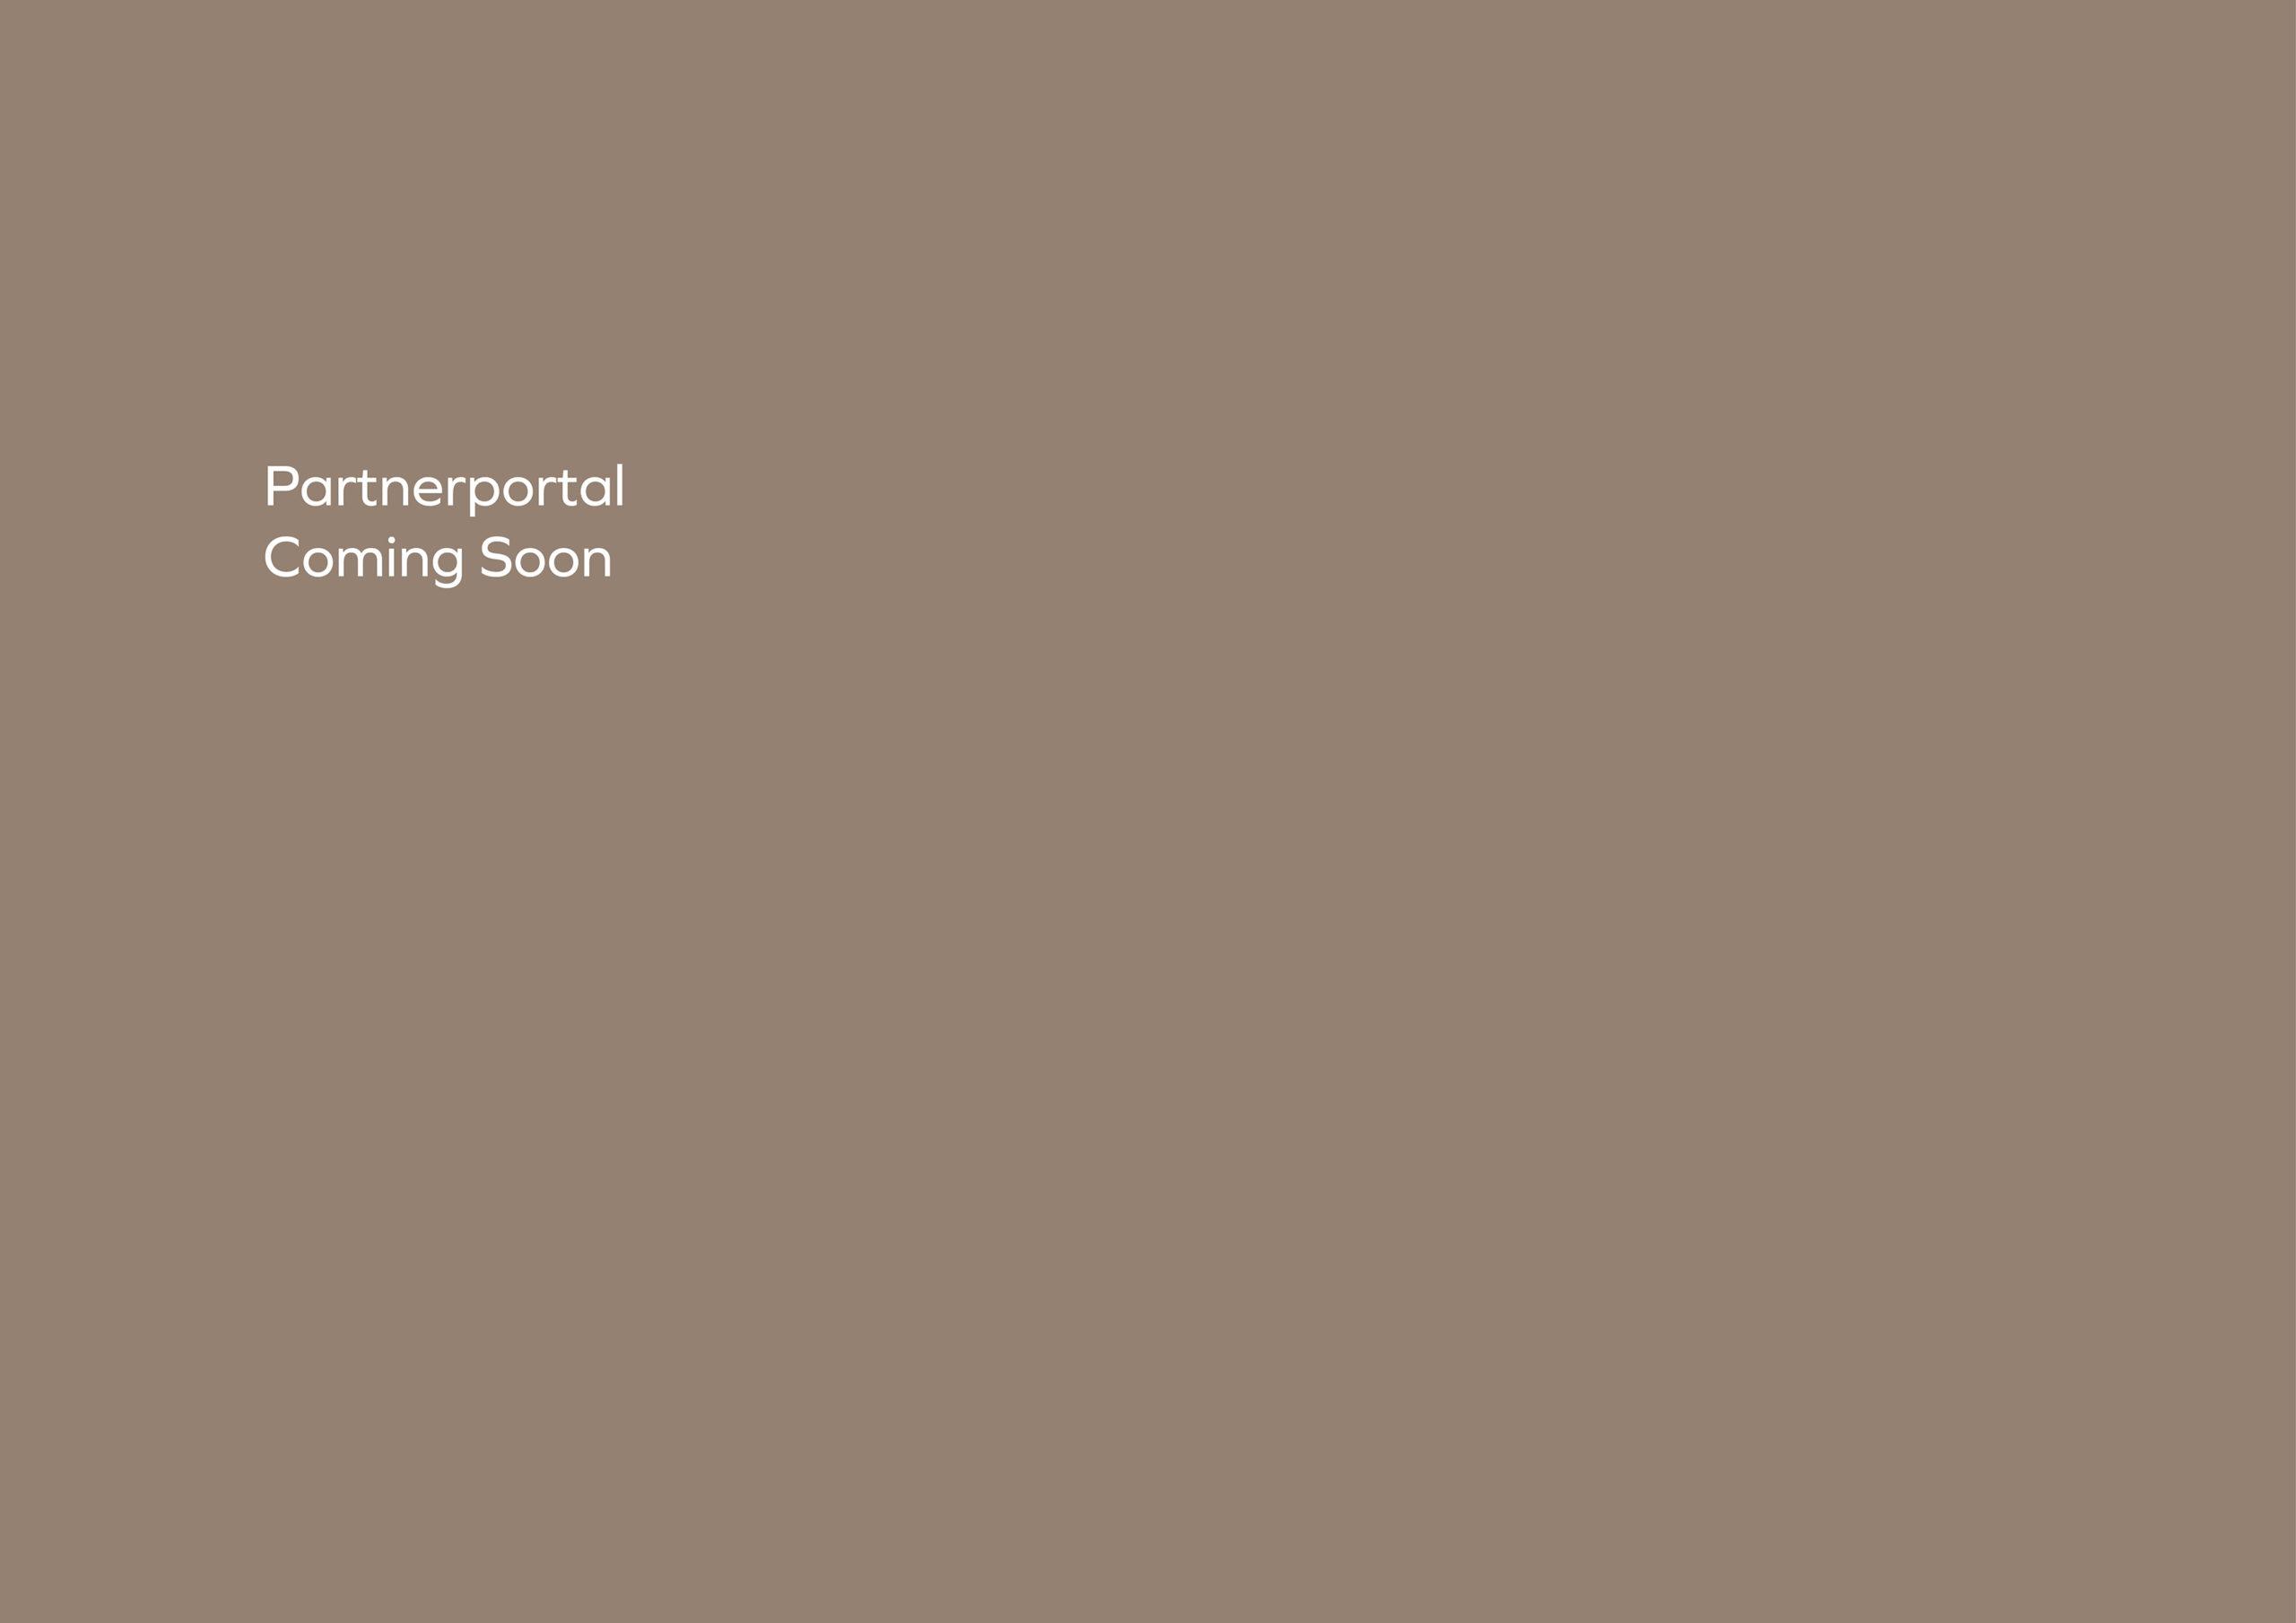 Robert La Roche - SLIDER 3510x2482 2 scaled